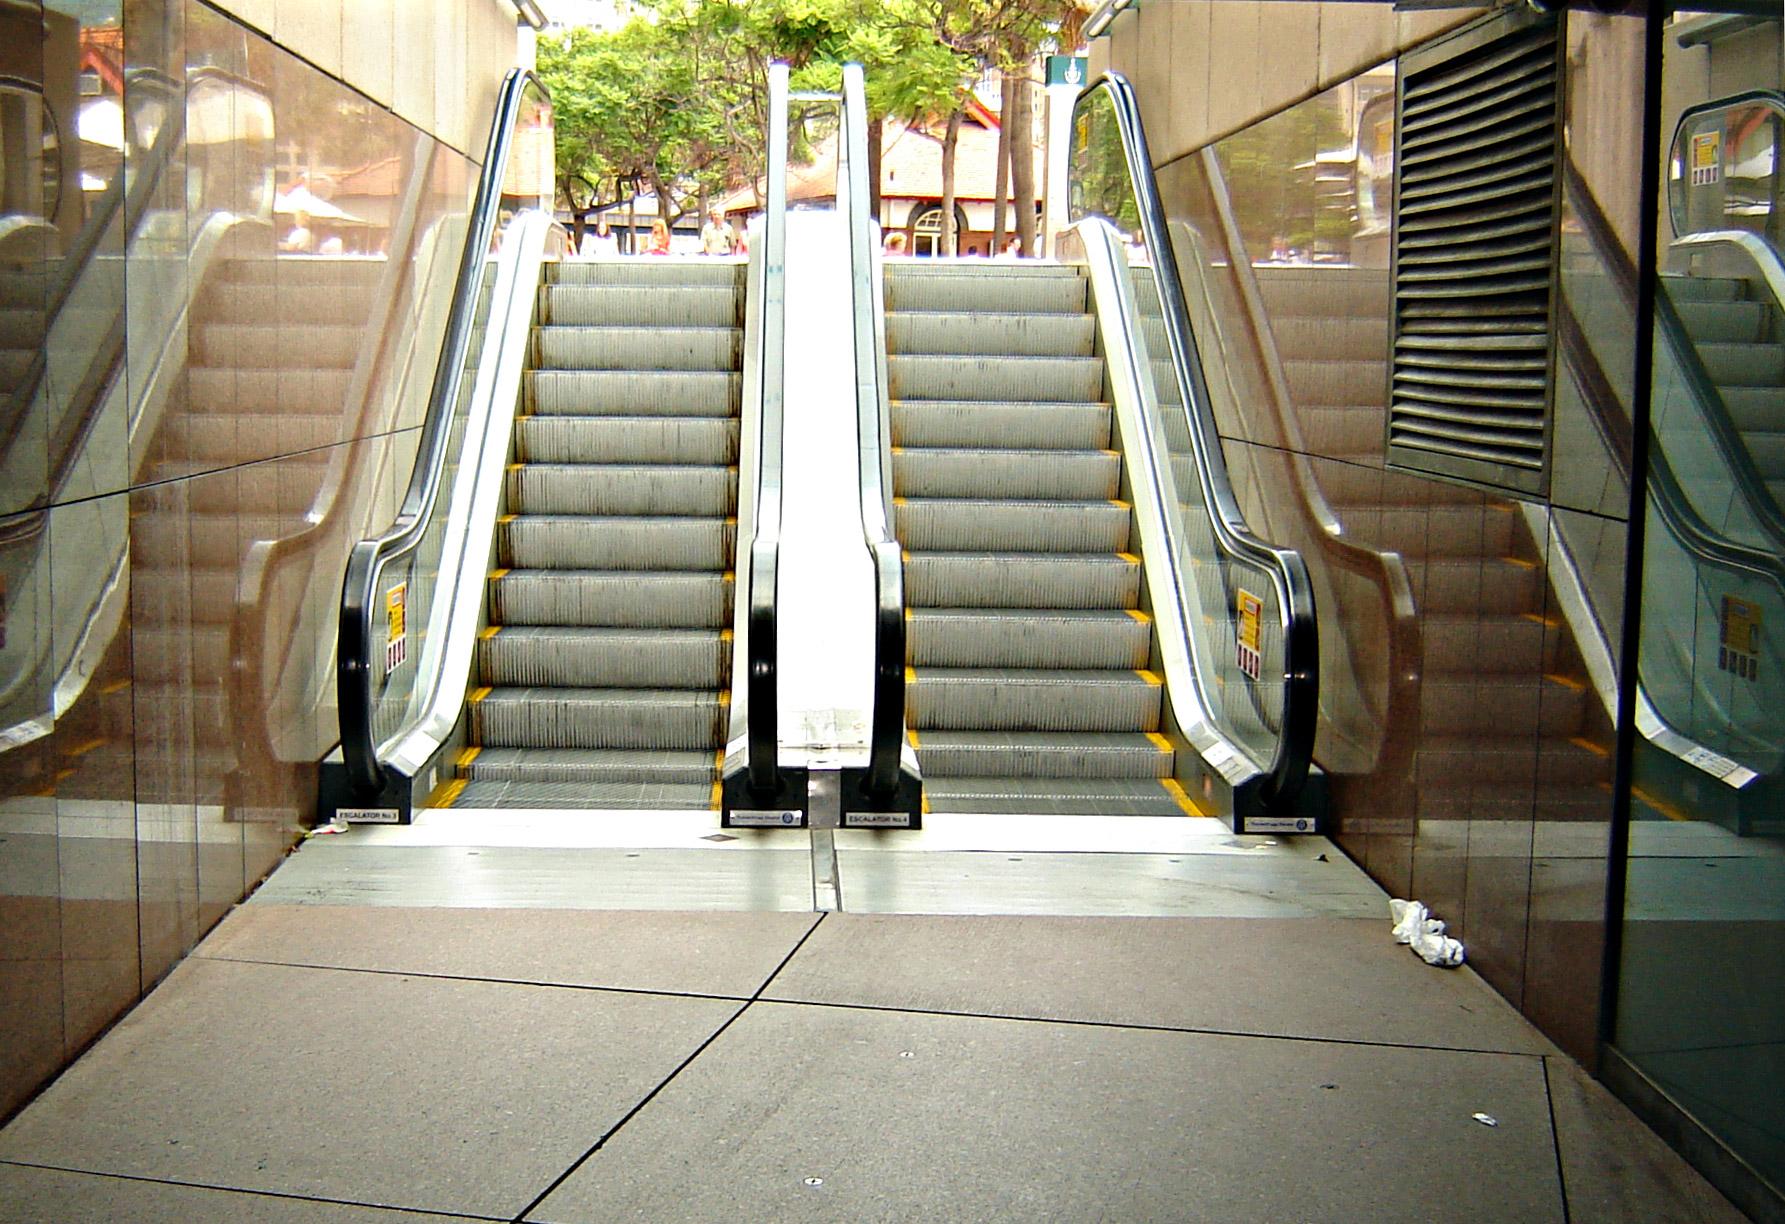 Escalators, Electrical, Stairs, Tunnel, Walkway, HQ Photo